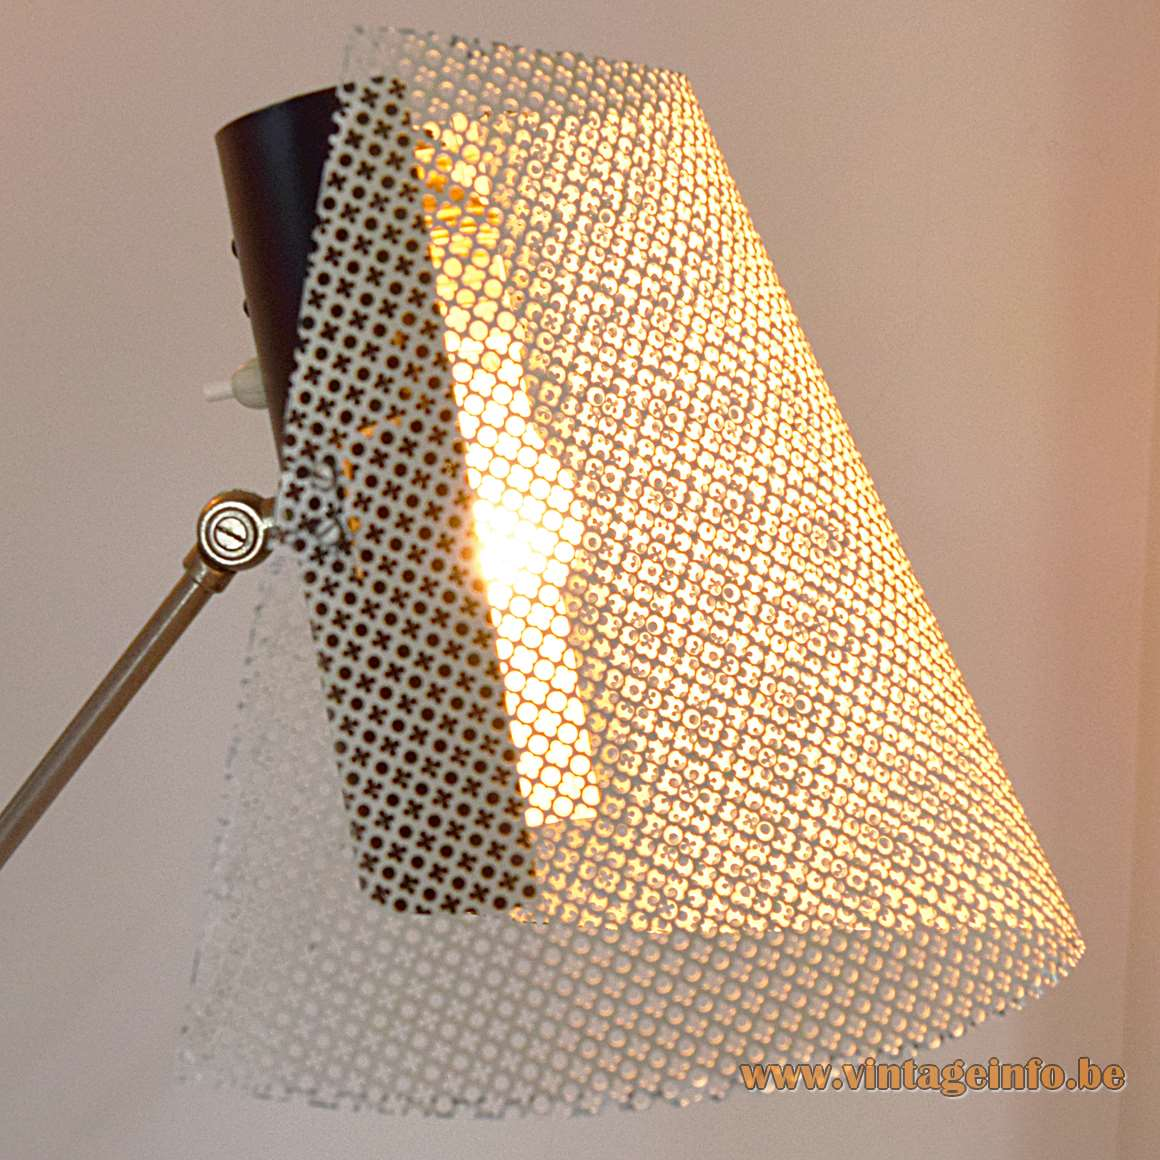 1950s Metal Grid/Perforated Floor Lamp